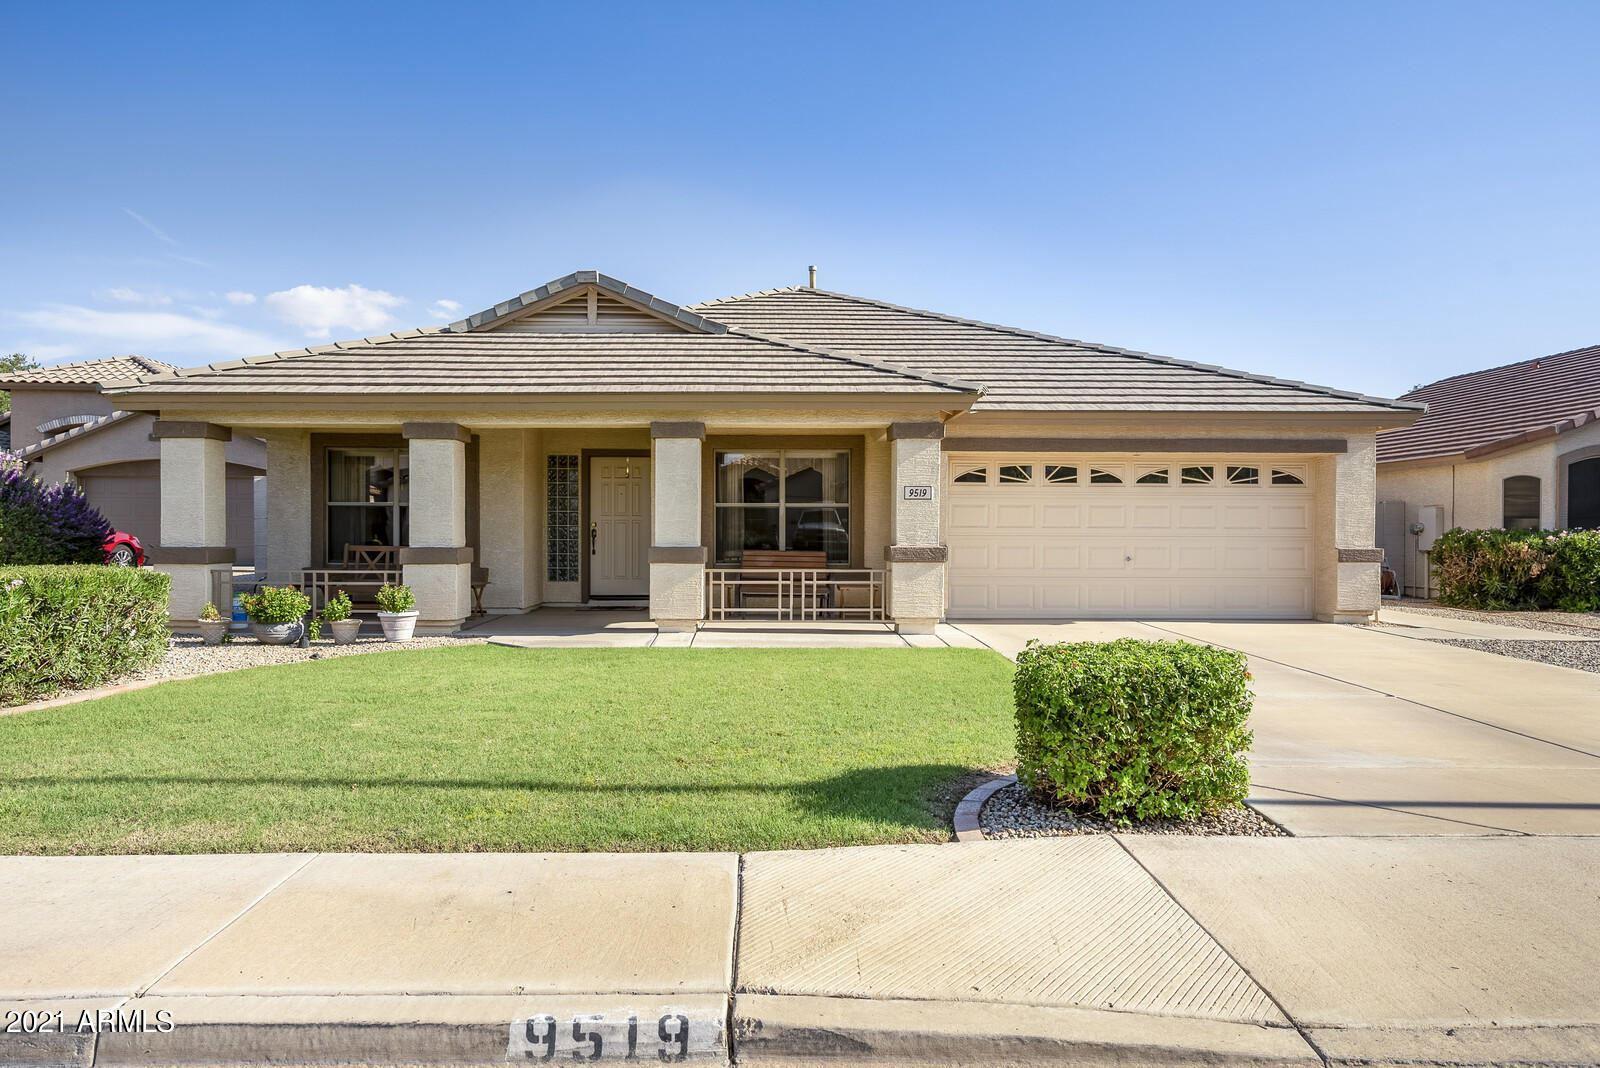 9519 E OLLA Circle, Mesa, AZ 85212 - MLS#: 6271219